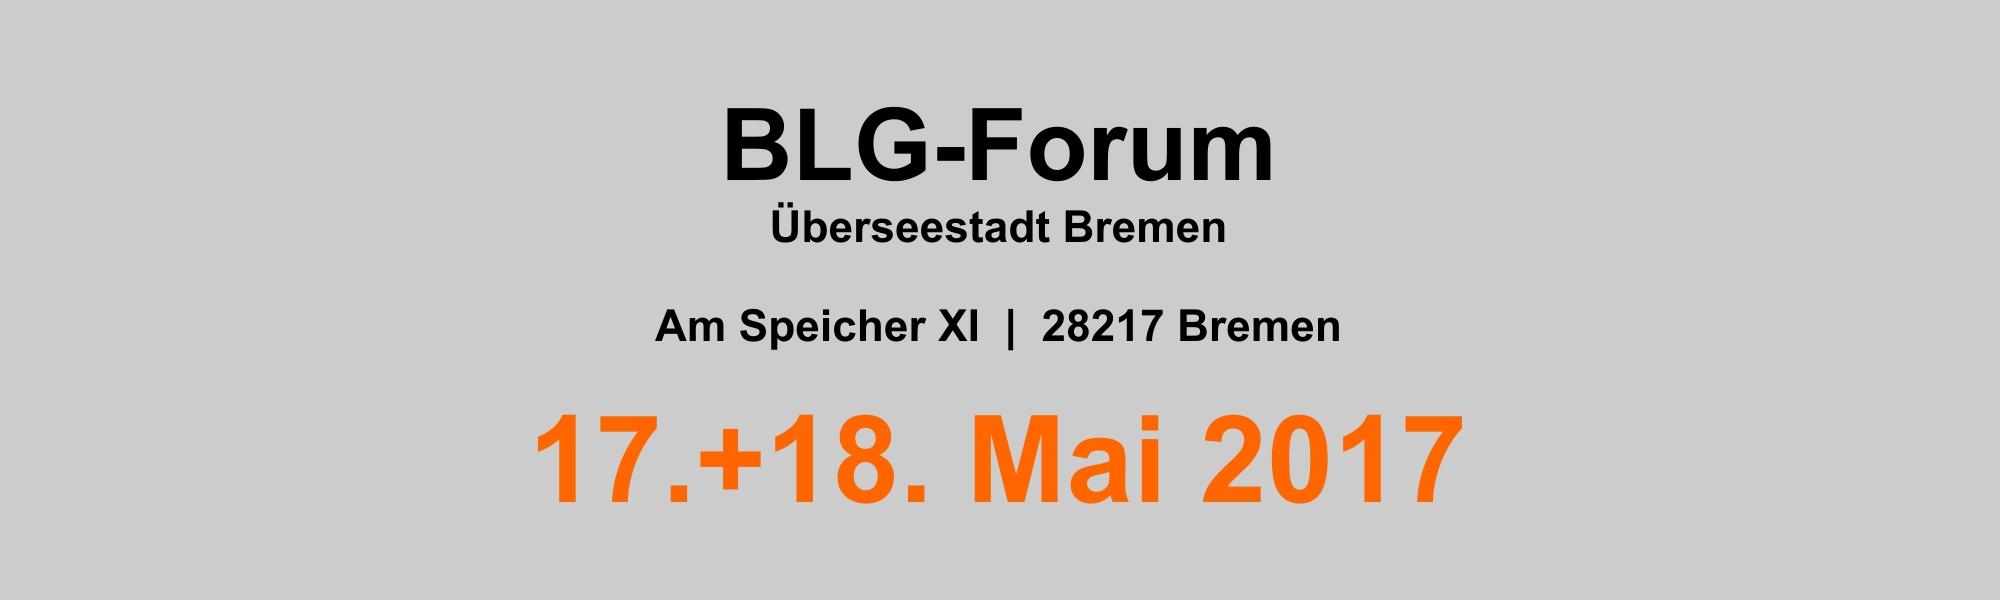 Banner - BLG-Forum 2000x600